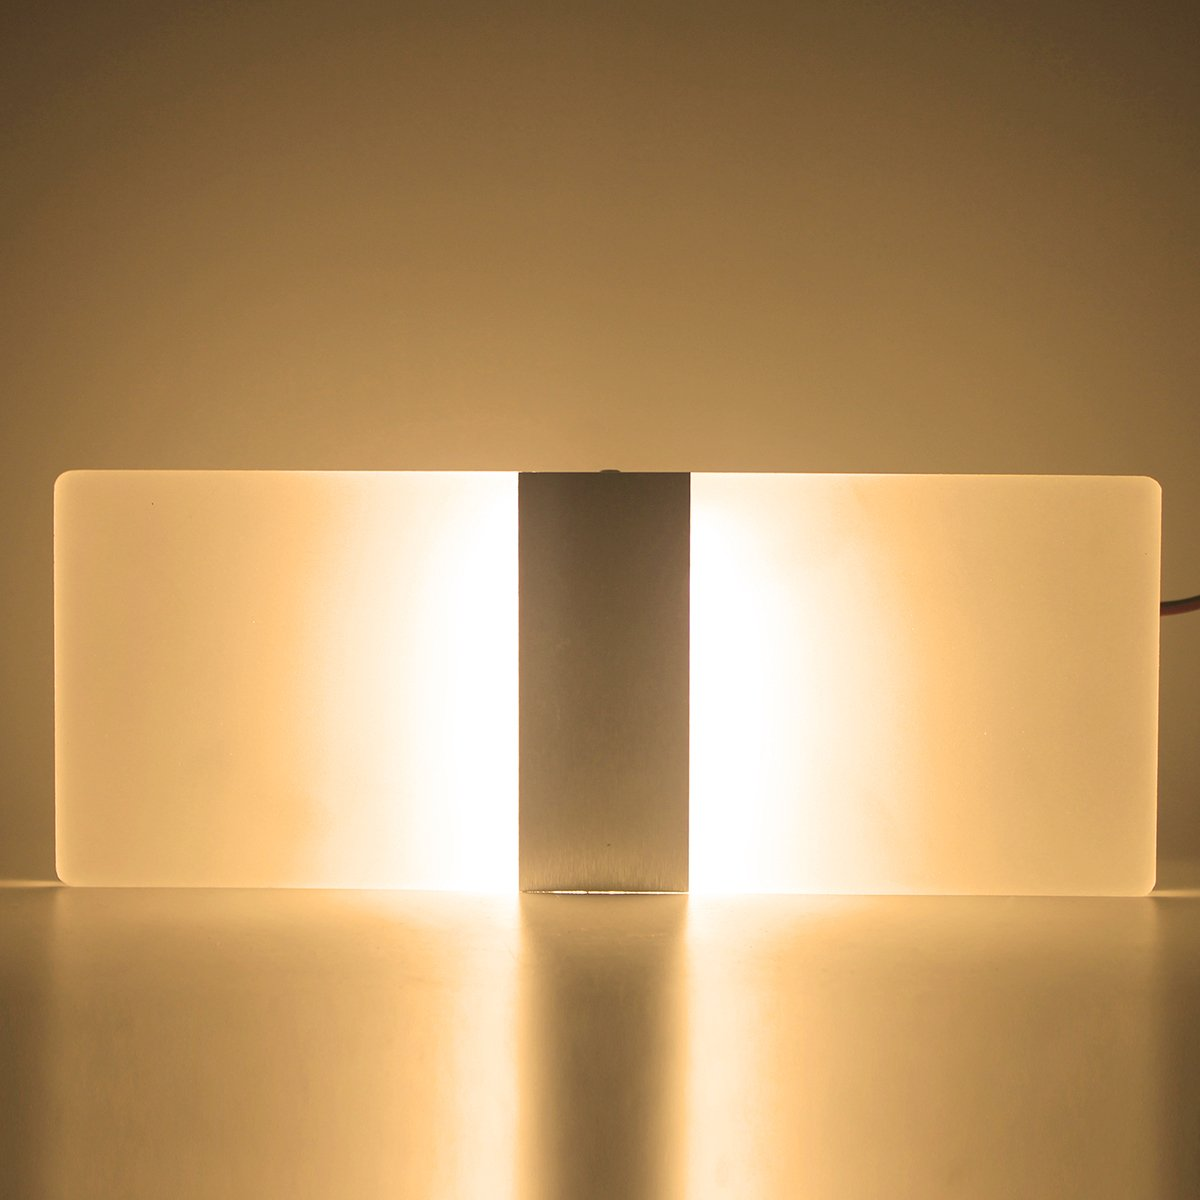 Modern Acrylic AC 85-265V 6W LED Wall Lamp Light Sconce Decorative ...